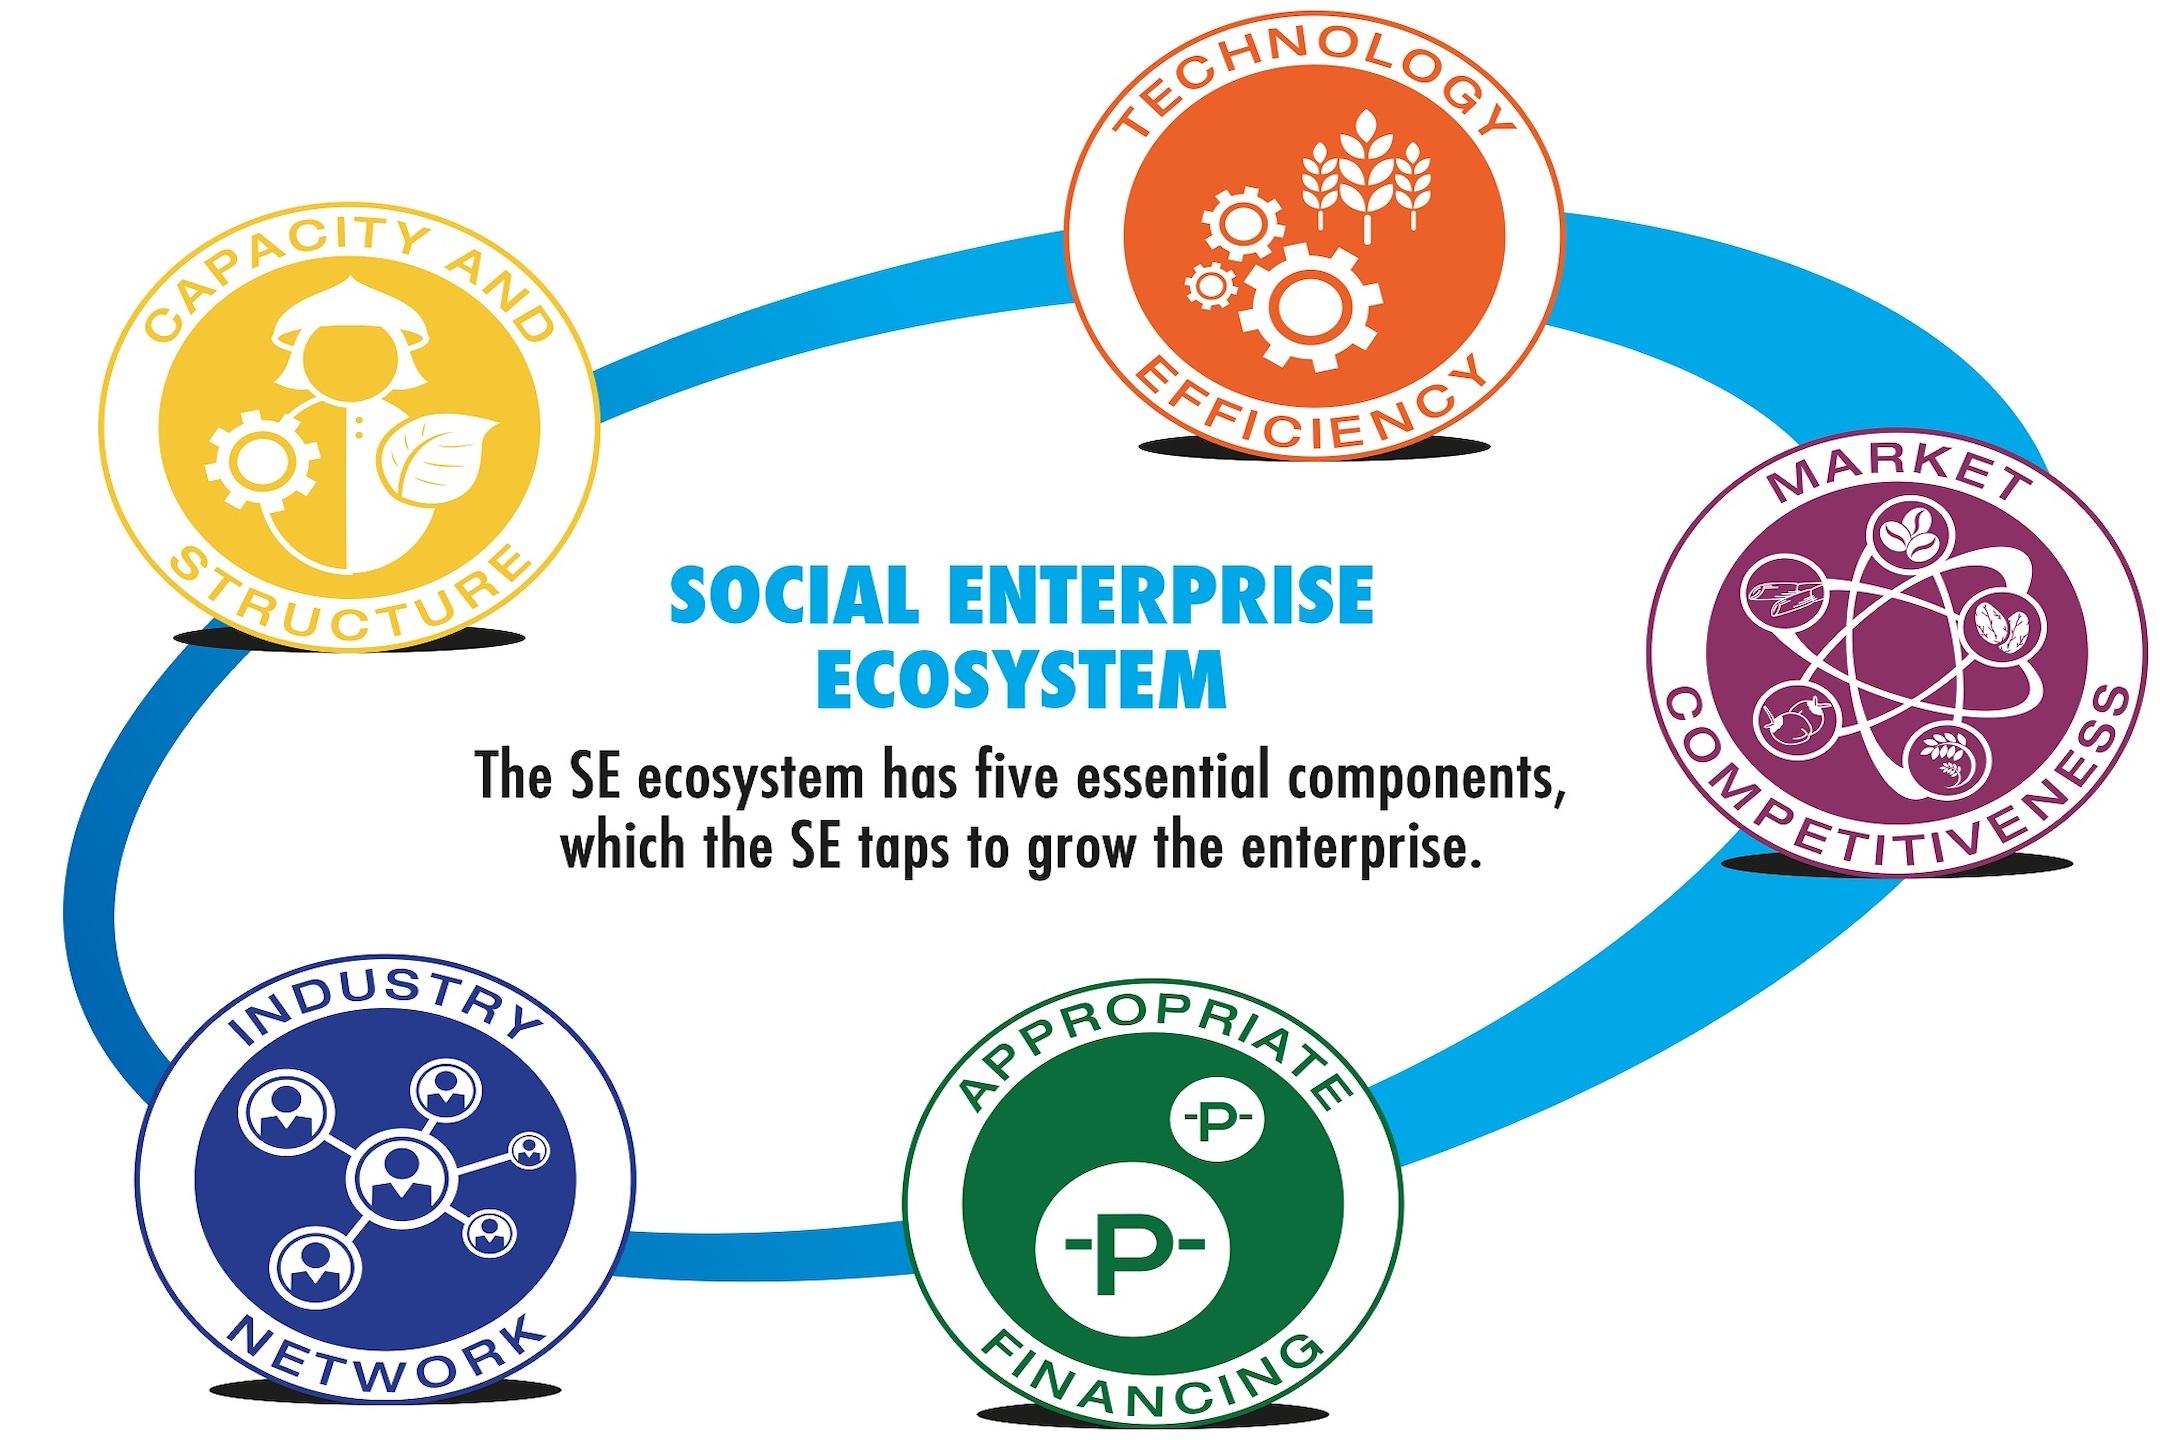 2012: Building  the SE ecosystem